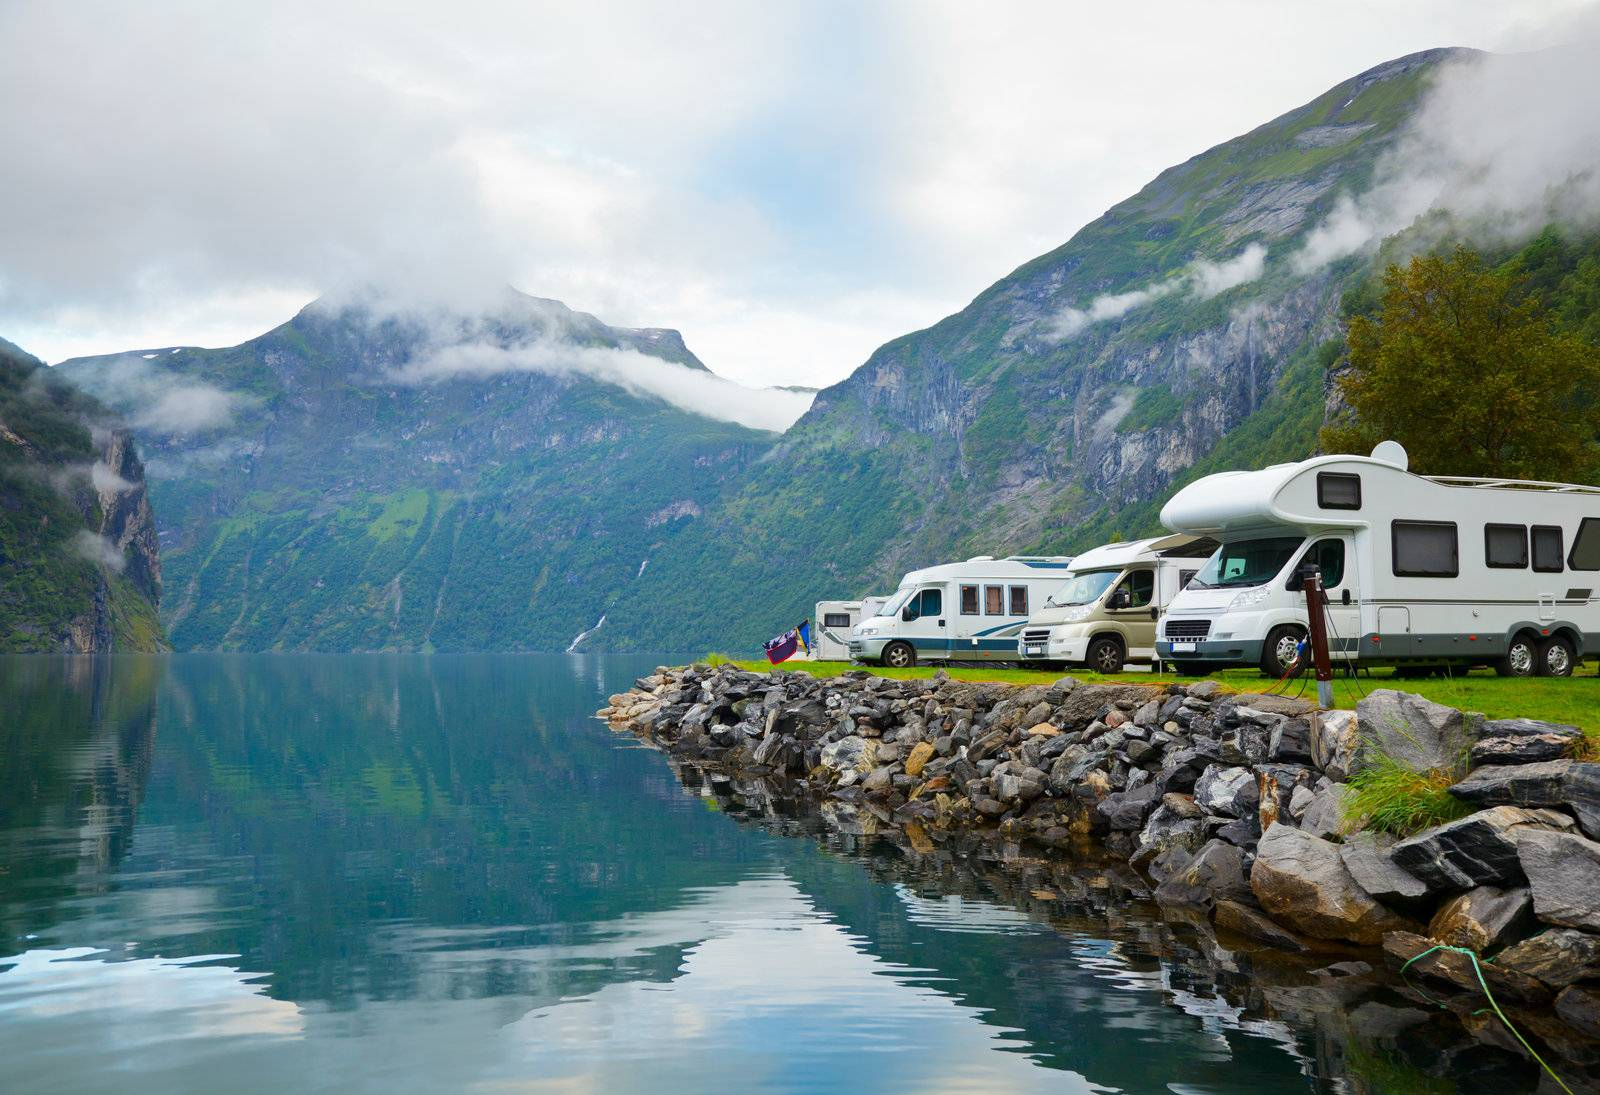 attraktion automobil schoenheit camper campingplatz campingplatz